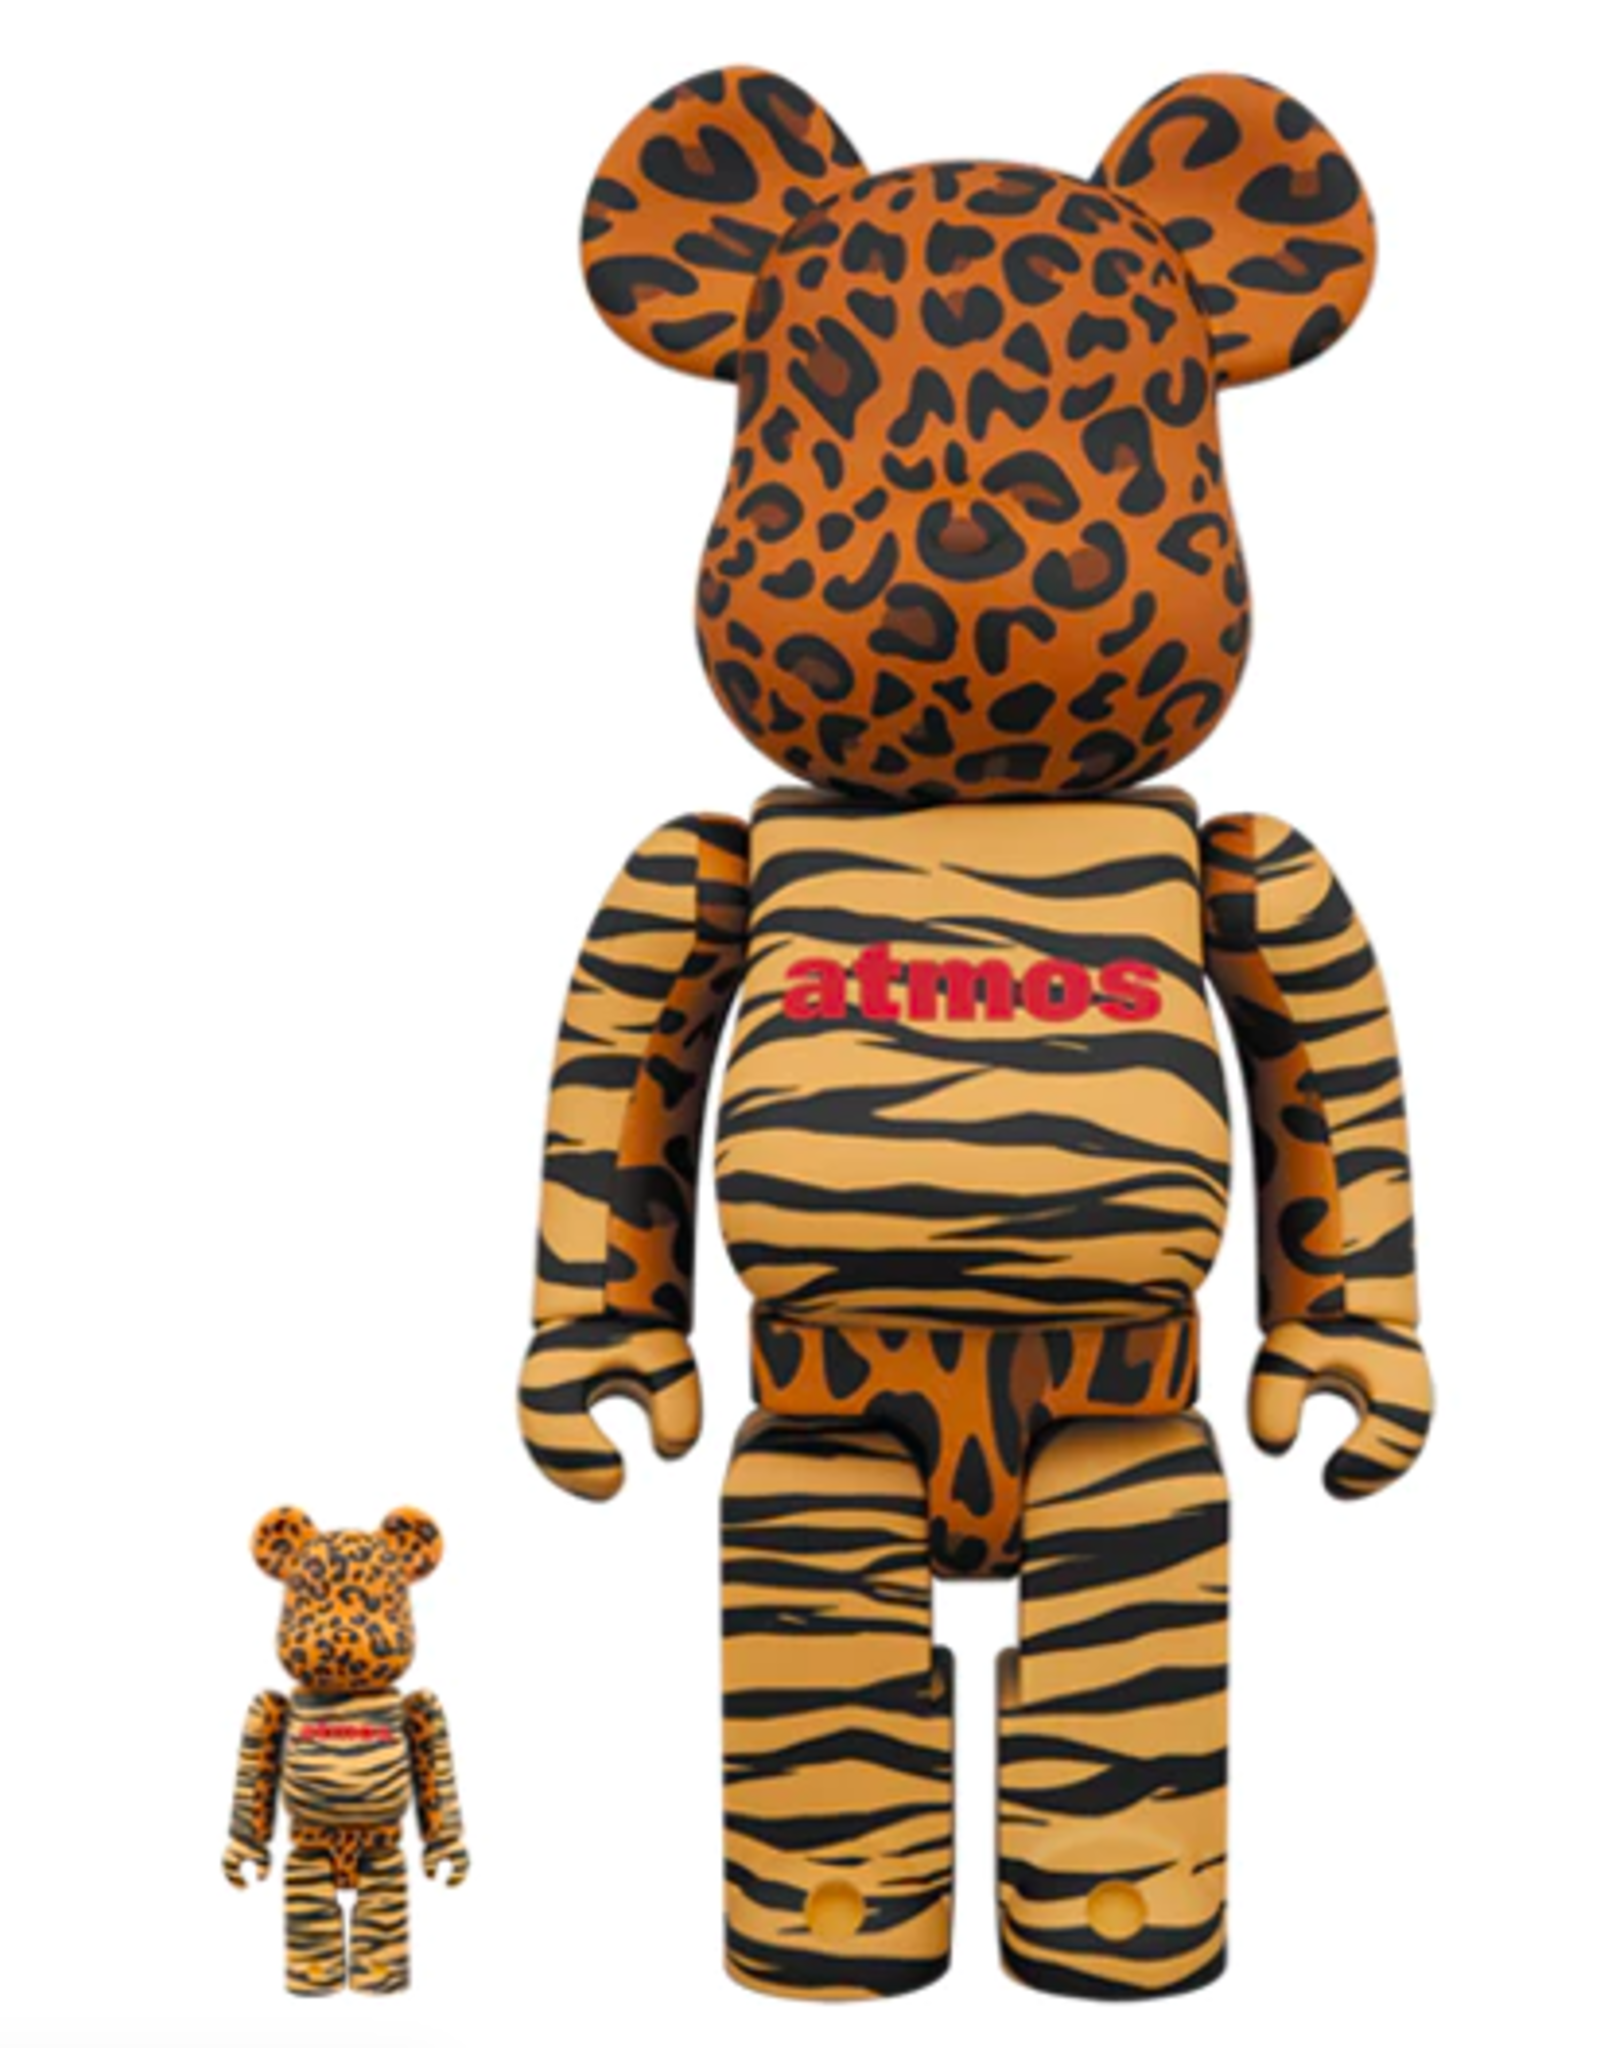 Bearbrick Atmos Animal 100% & 400% Set Orange